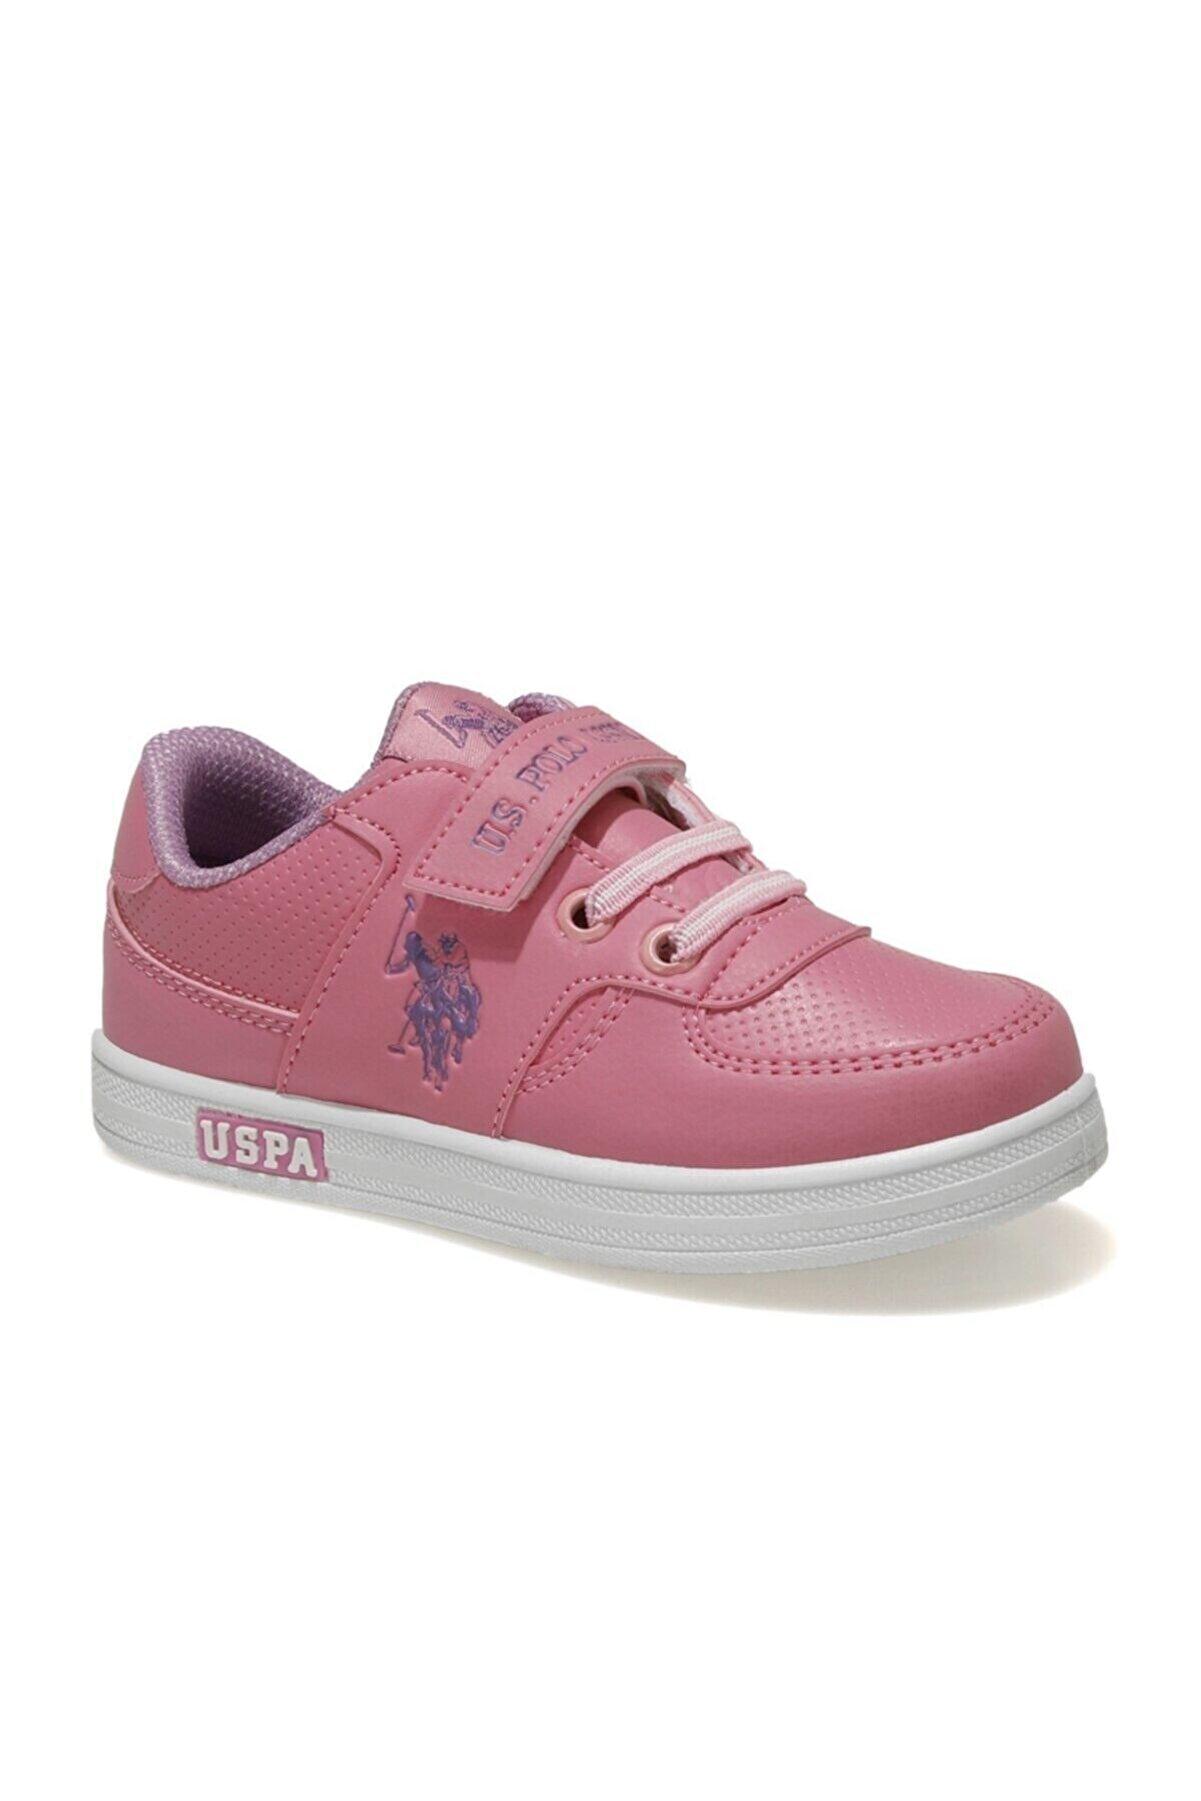 US Polo Assn CAMERON 1FX Pembe Kız Çocuk Sneaker 100909752